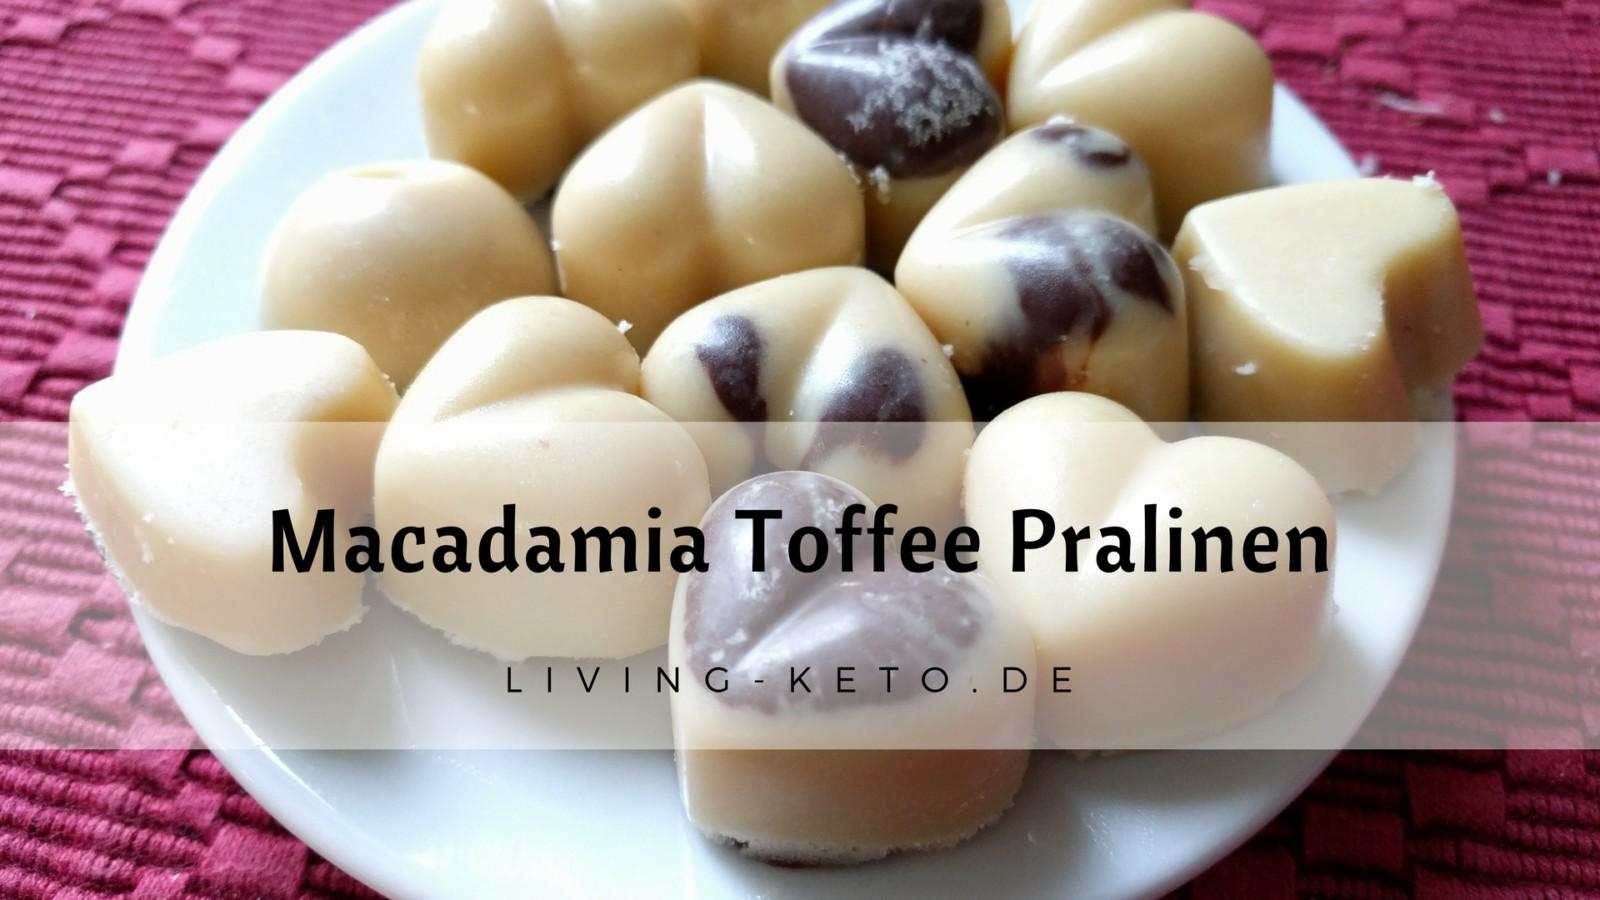 Macadamia Toffee Pralinen